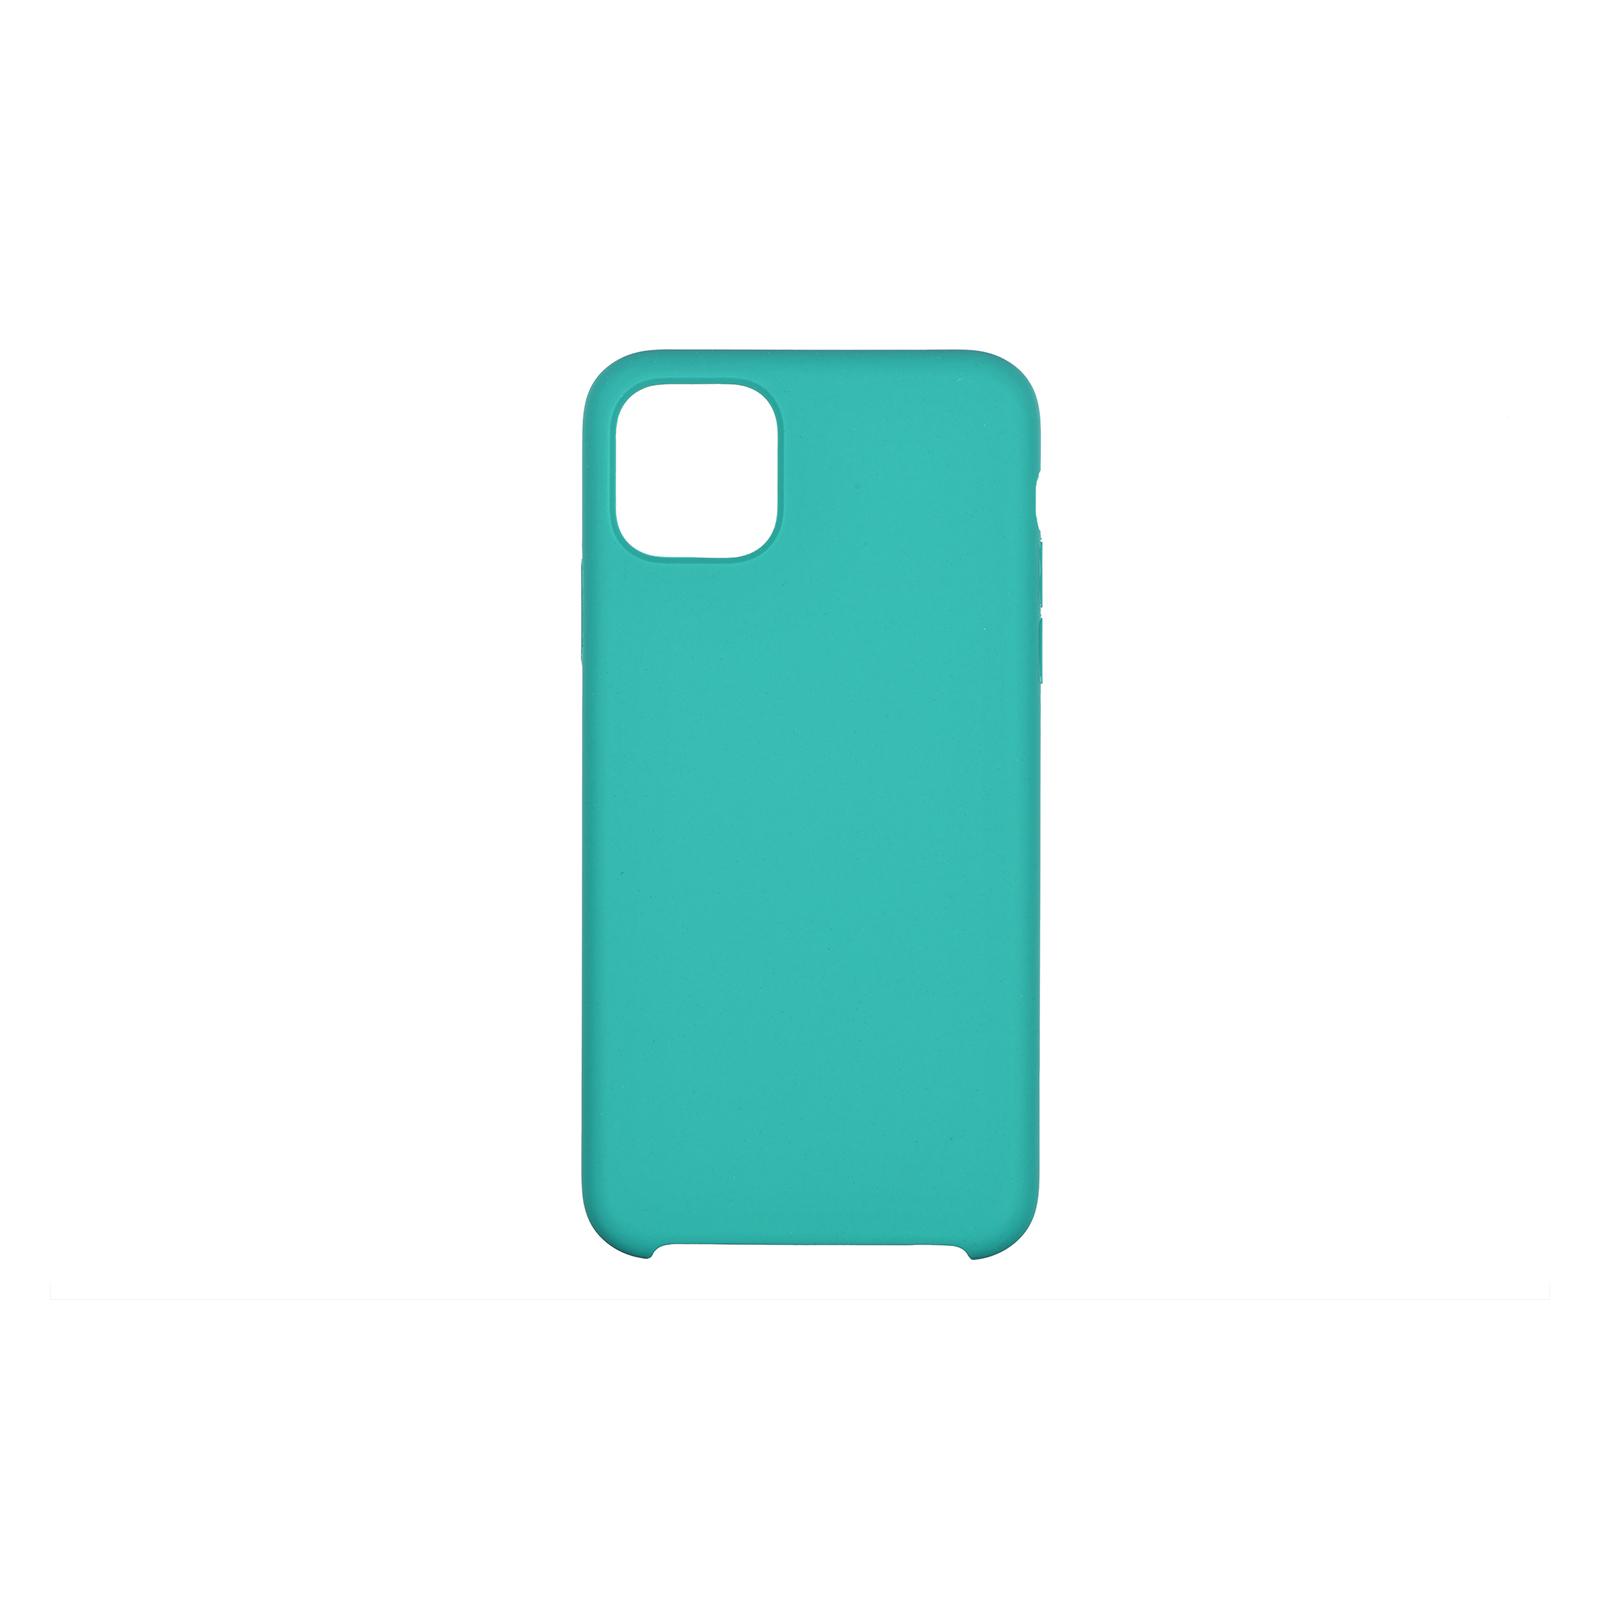 "Чехол для моб. телефона 2E Apple iPhone 11 Pro Max (6.5""), Liquid Silicone, Dark Green (2E-IPH-11PRM-OCLS-DG)"